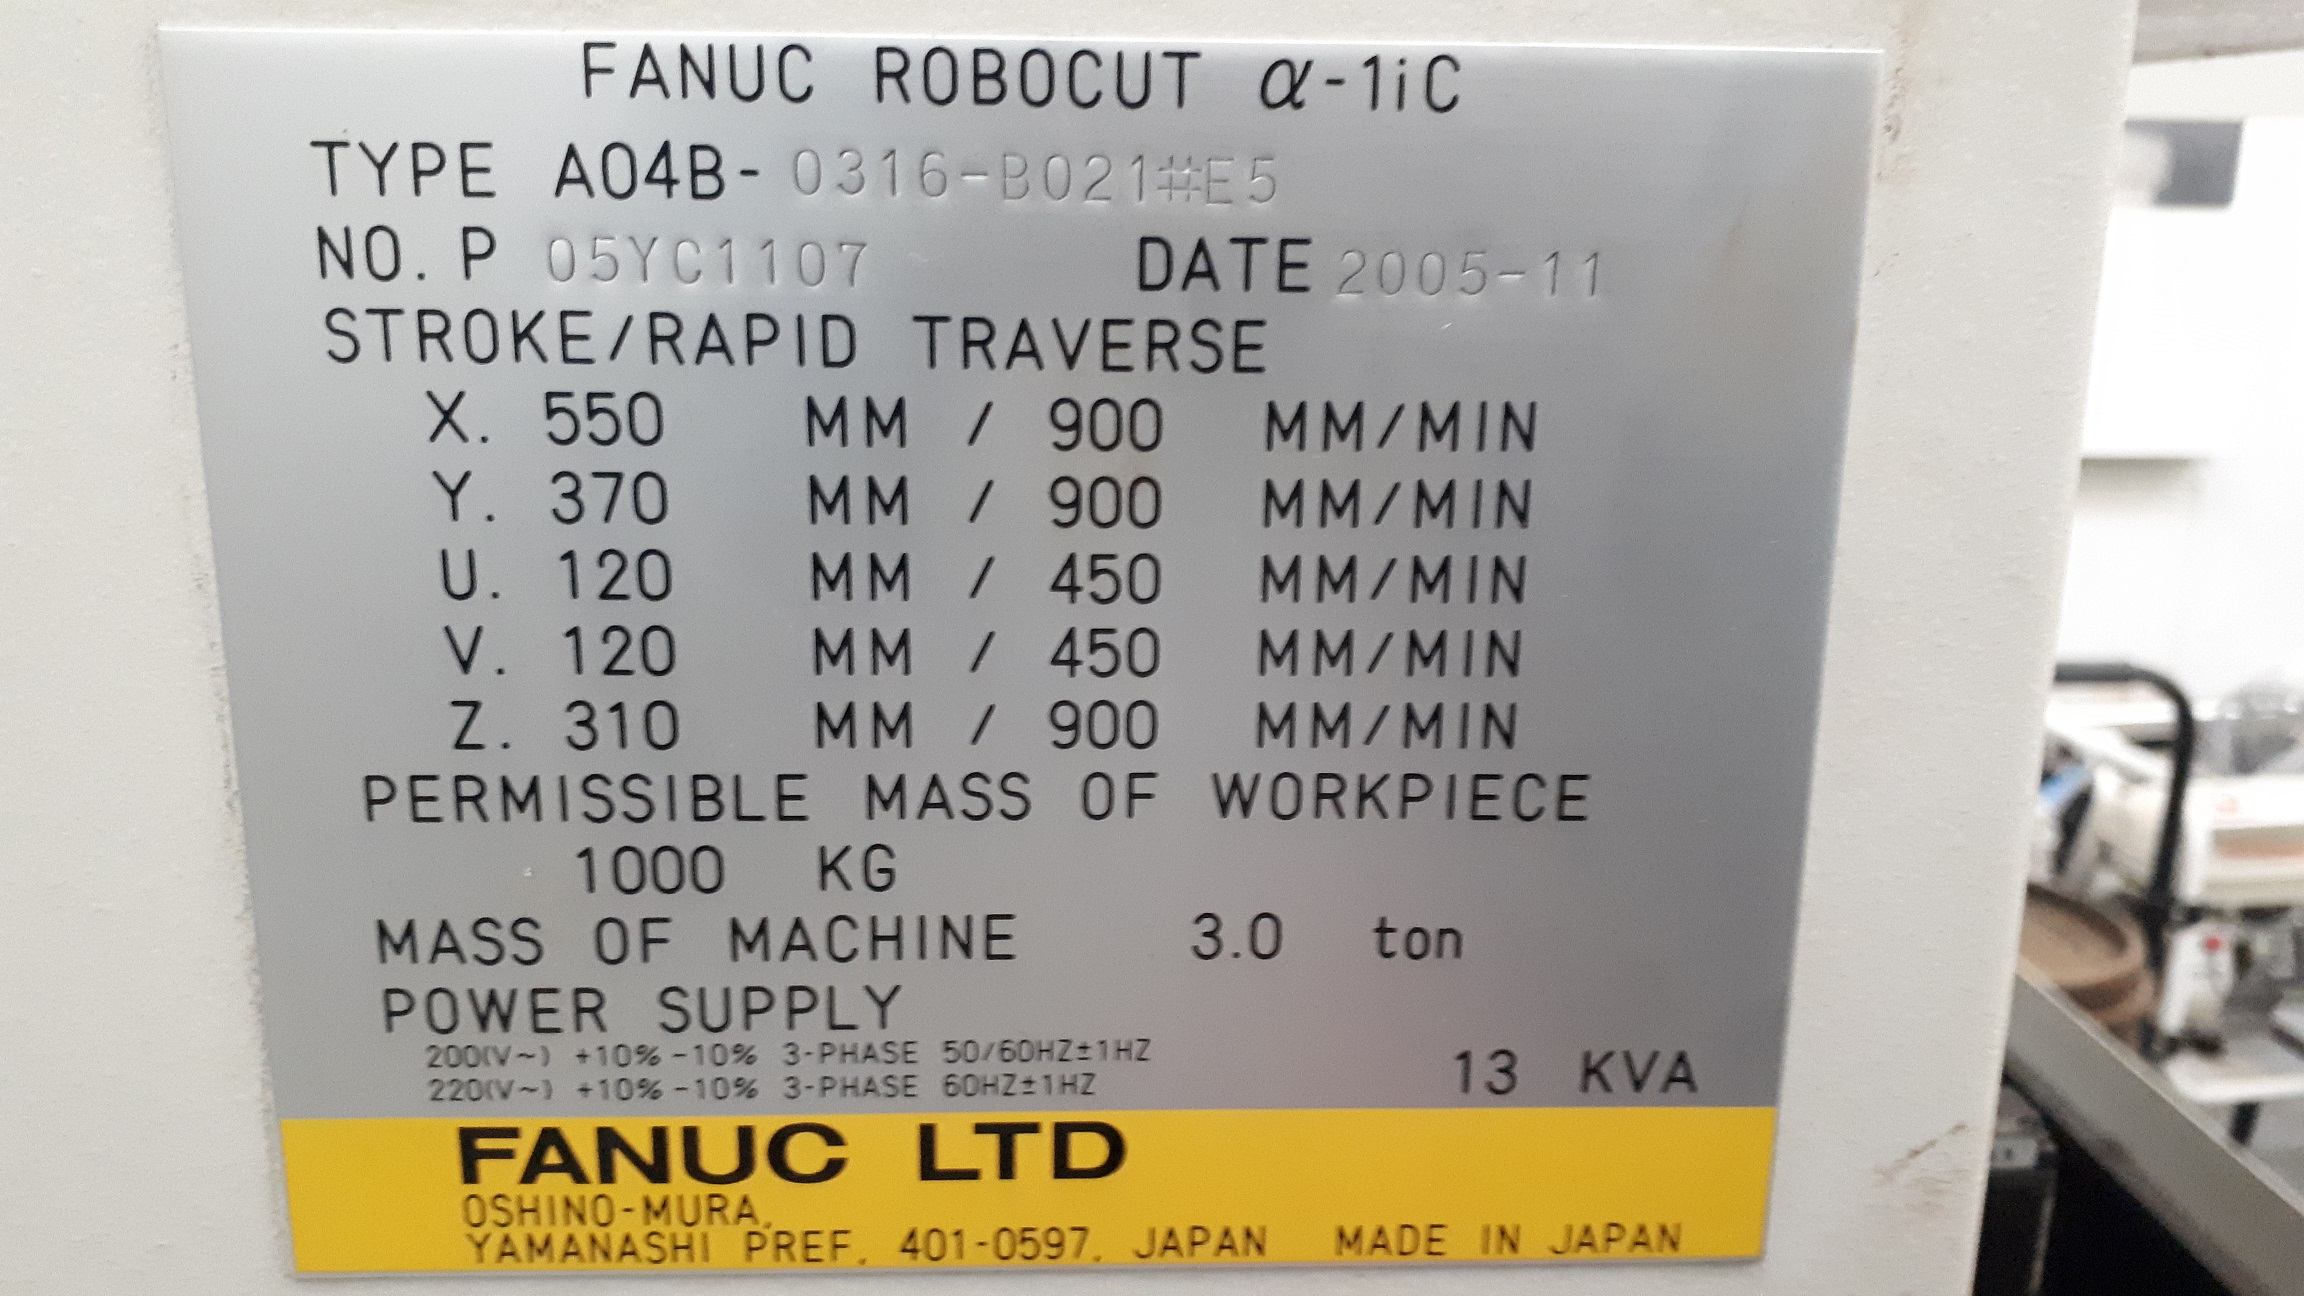 FANUC ROBOCUT ALFA-1iC in vendita - foto 2